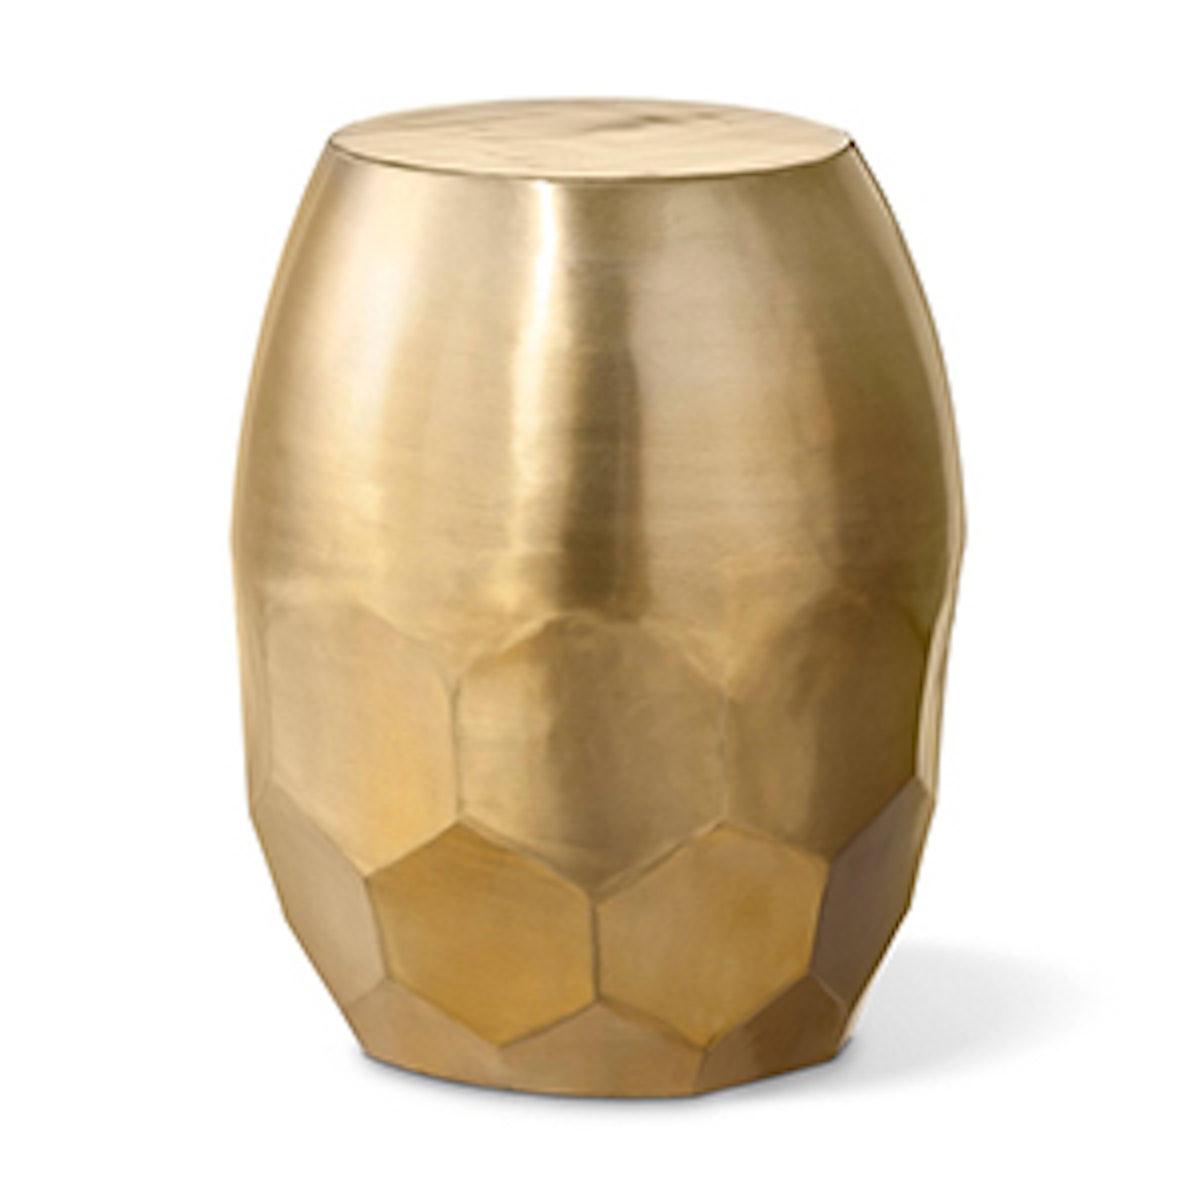 Highland Honeycomb Barrel